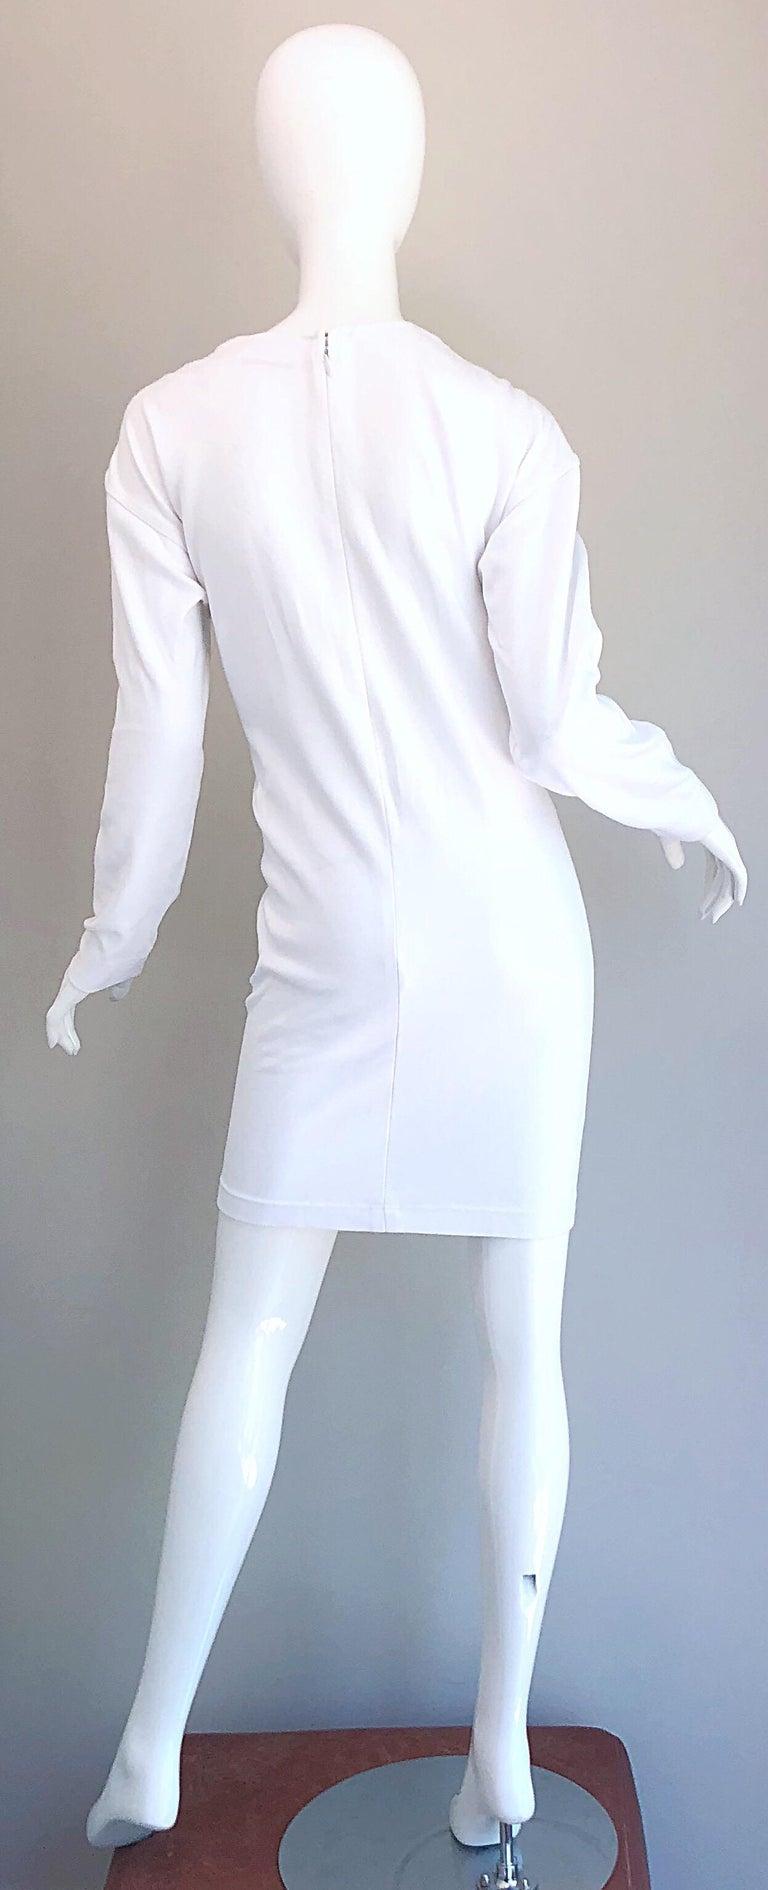 1990s Bill Blass Logo Mania White + Gold Vintage 90s Sweatshirt Dress Medium For Sale 1